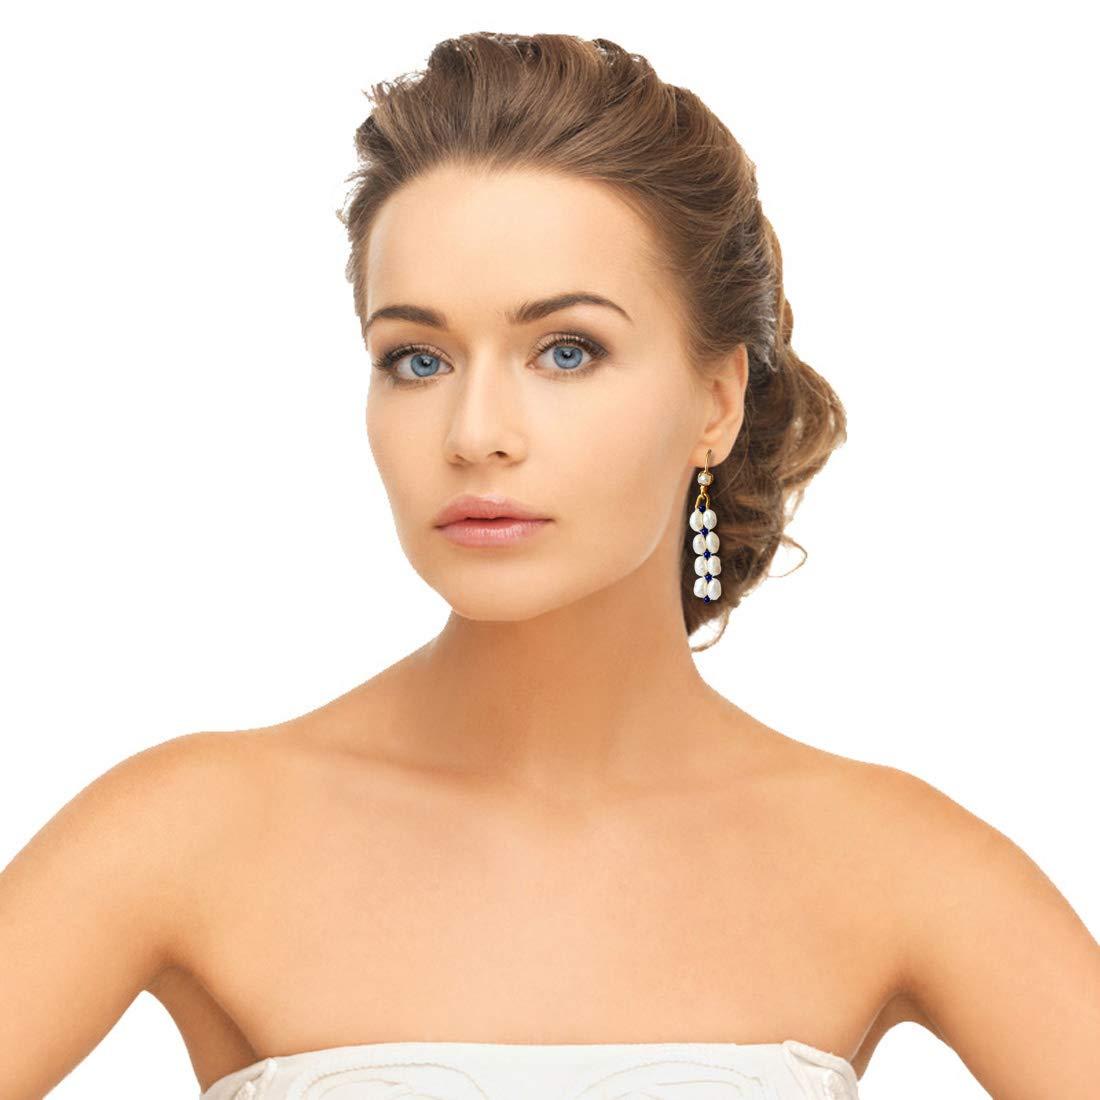 Blue Lapis Bliss - Real Rice Pearl & Blue Lapiz Beads Hanging Earrings for Women (SE33)